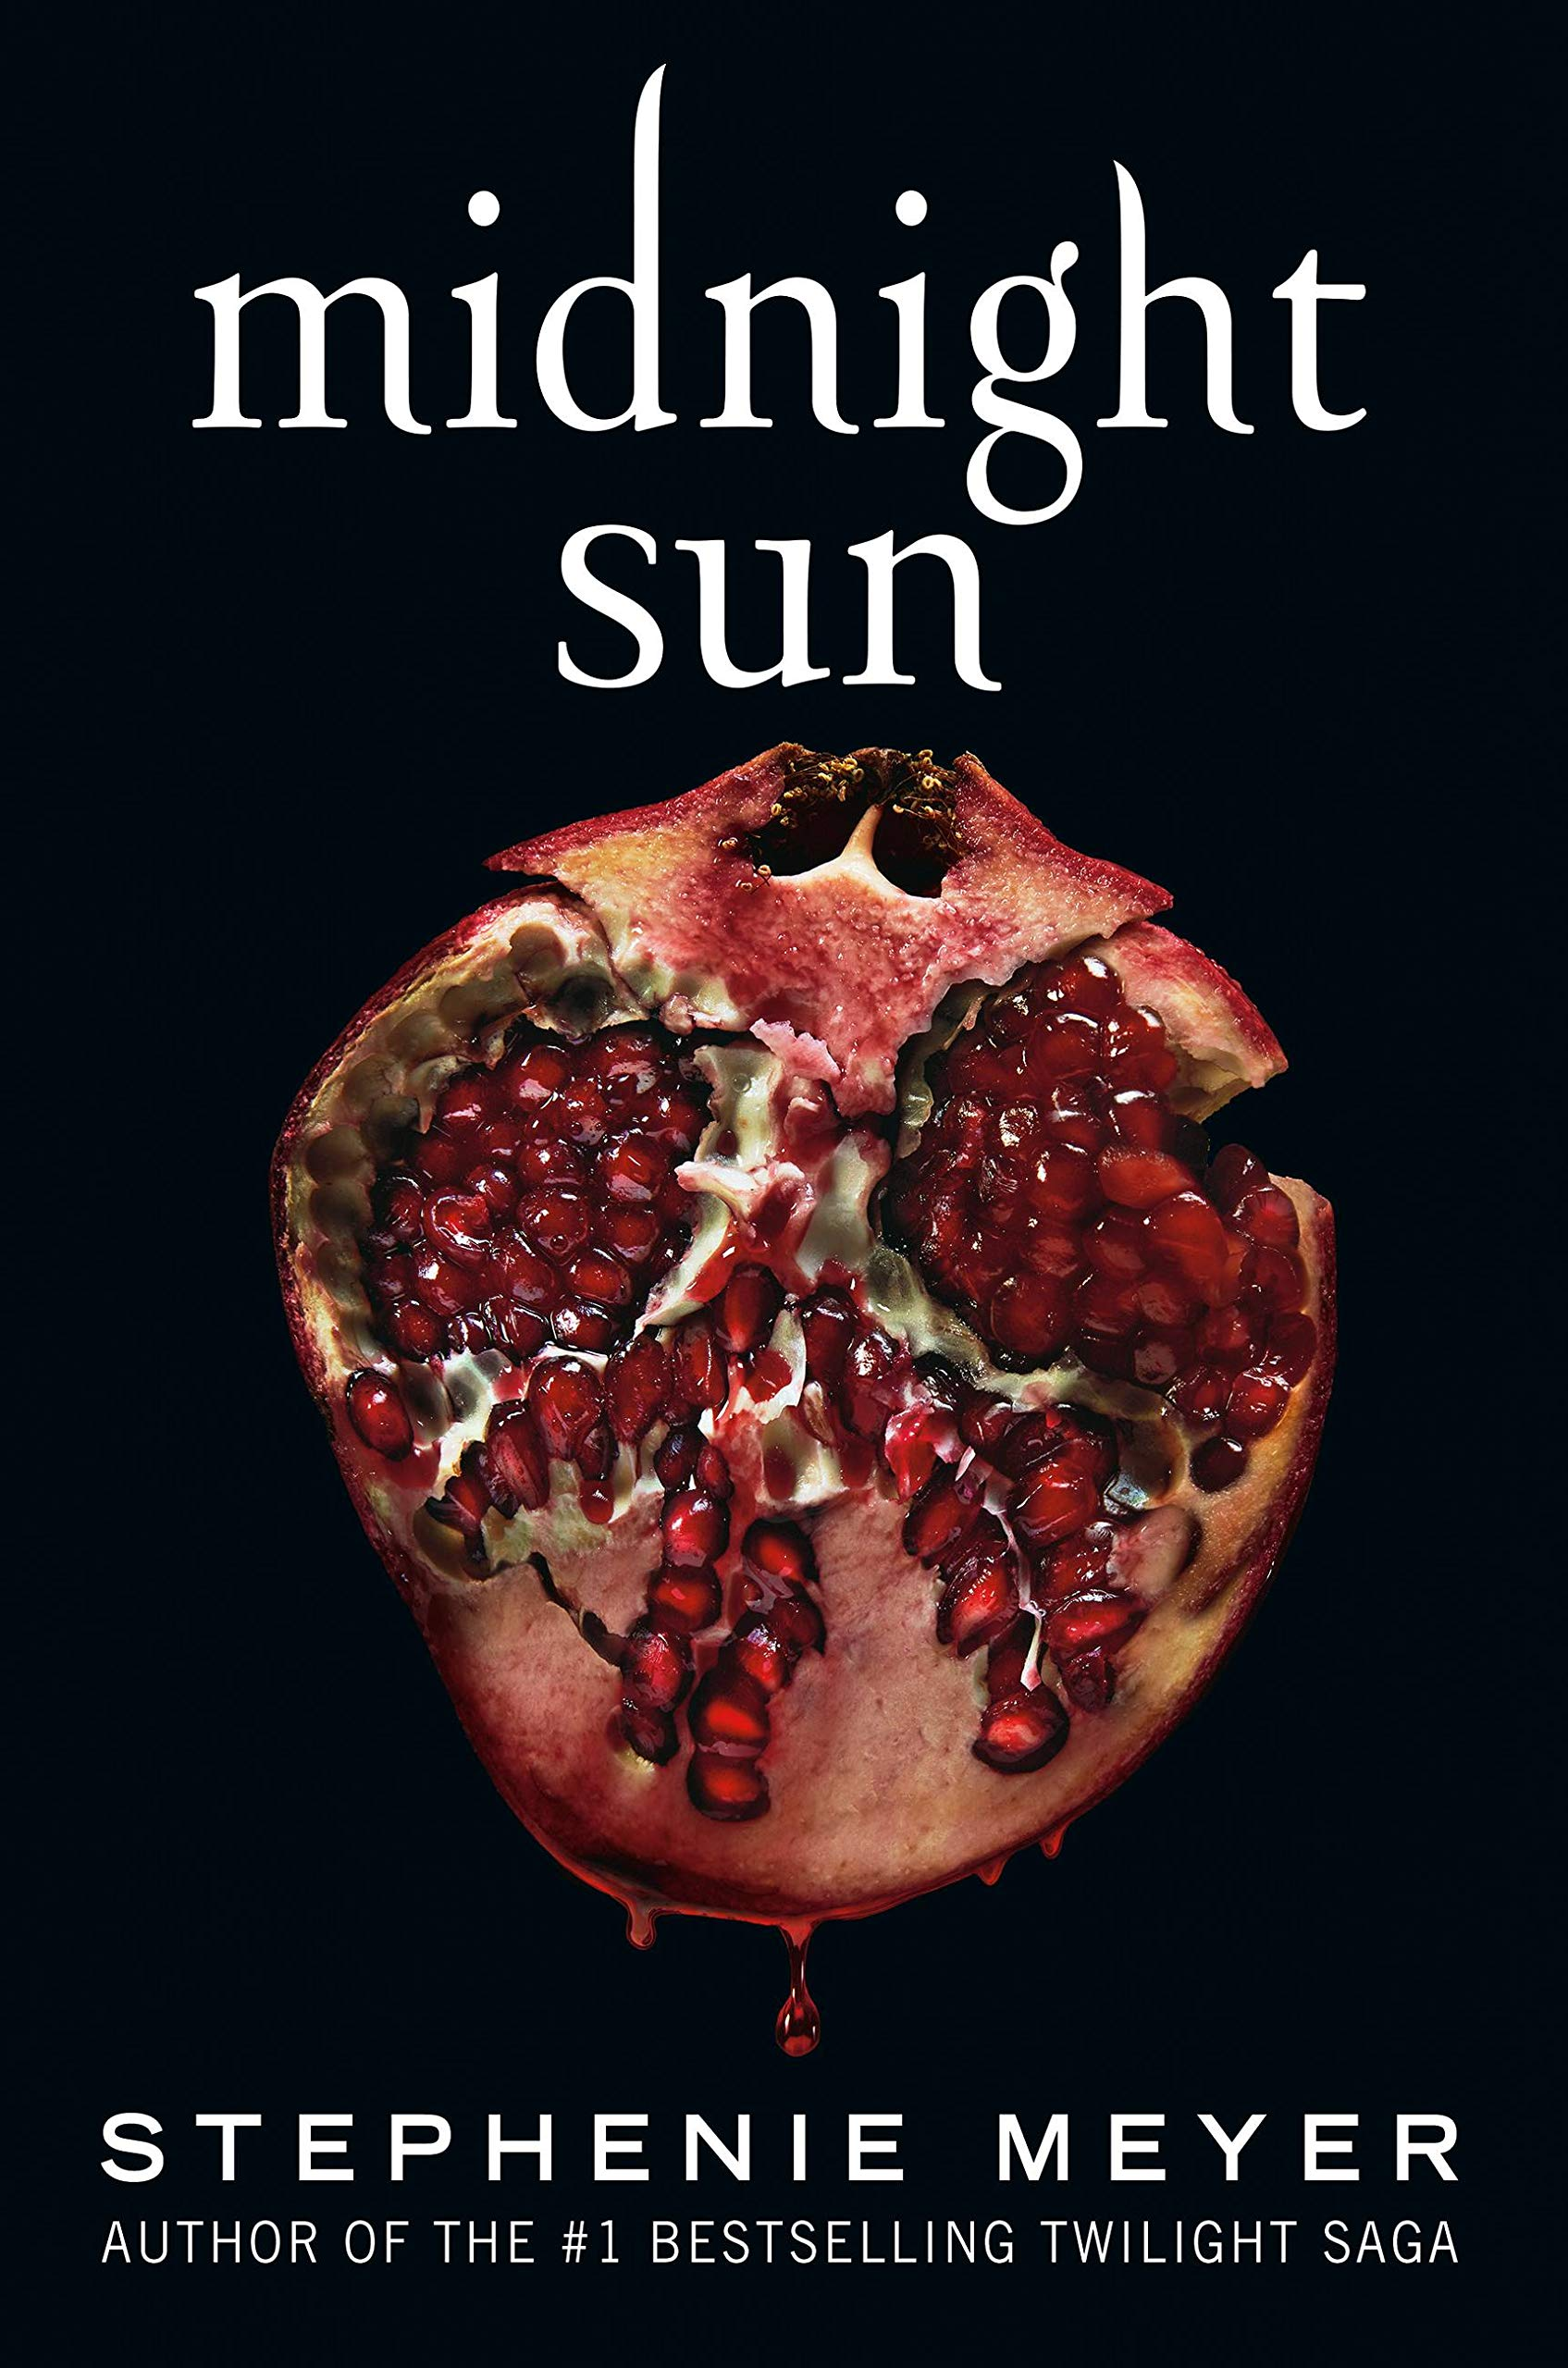 Amazon.com: Midnight Sun (9780316707046): Meyer, Stephenie: Books